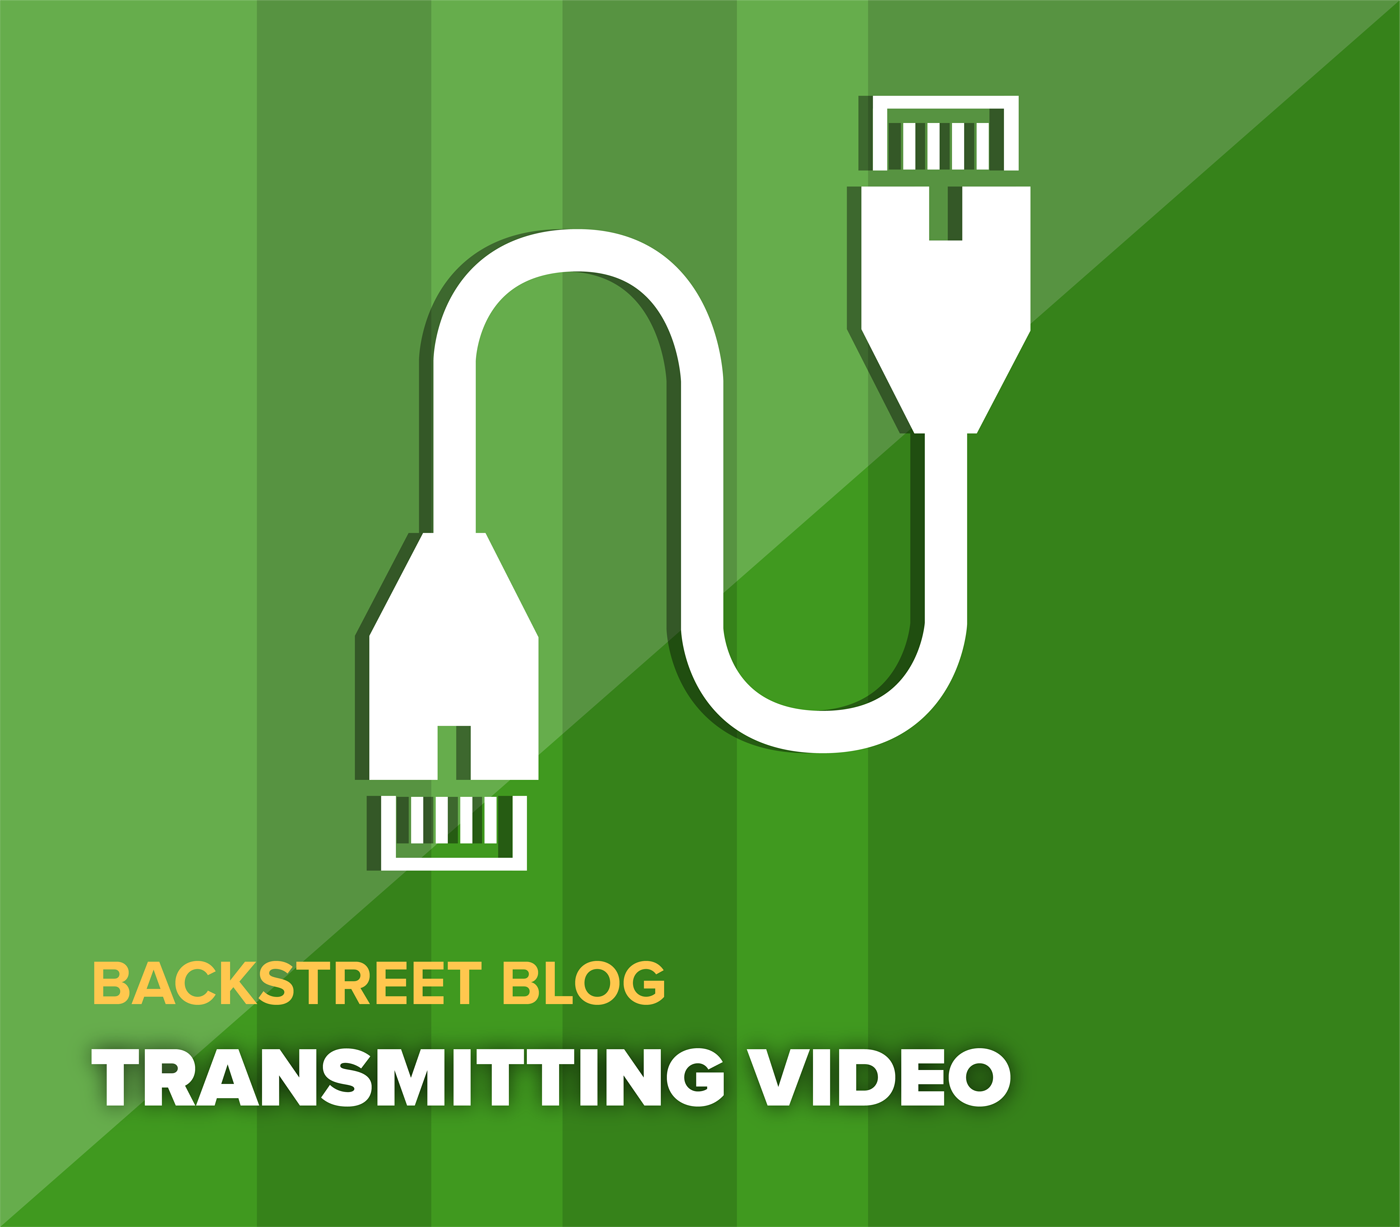 Transmitting Video - Coax, Network, Wifi